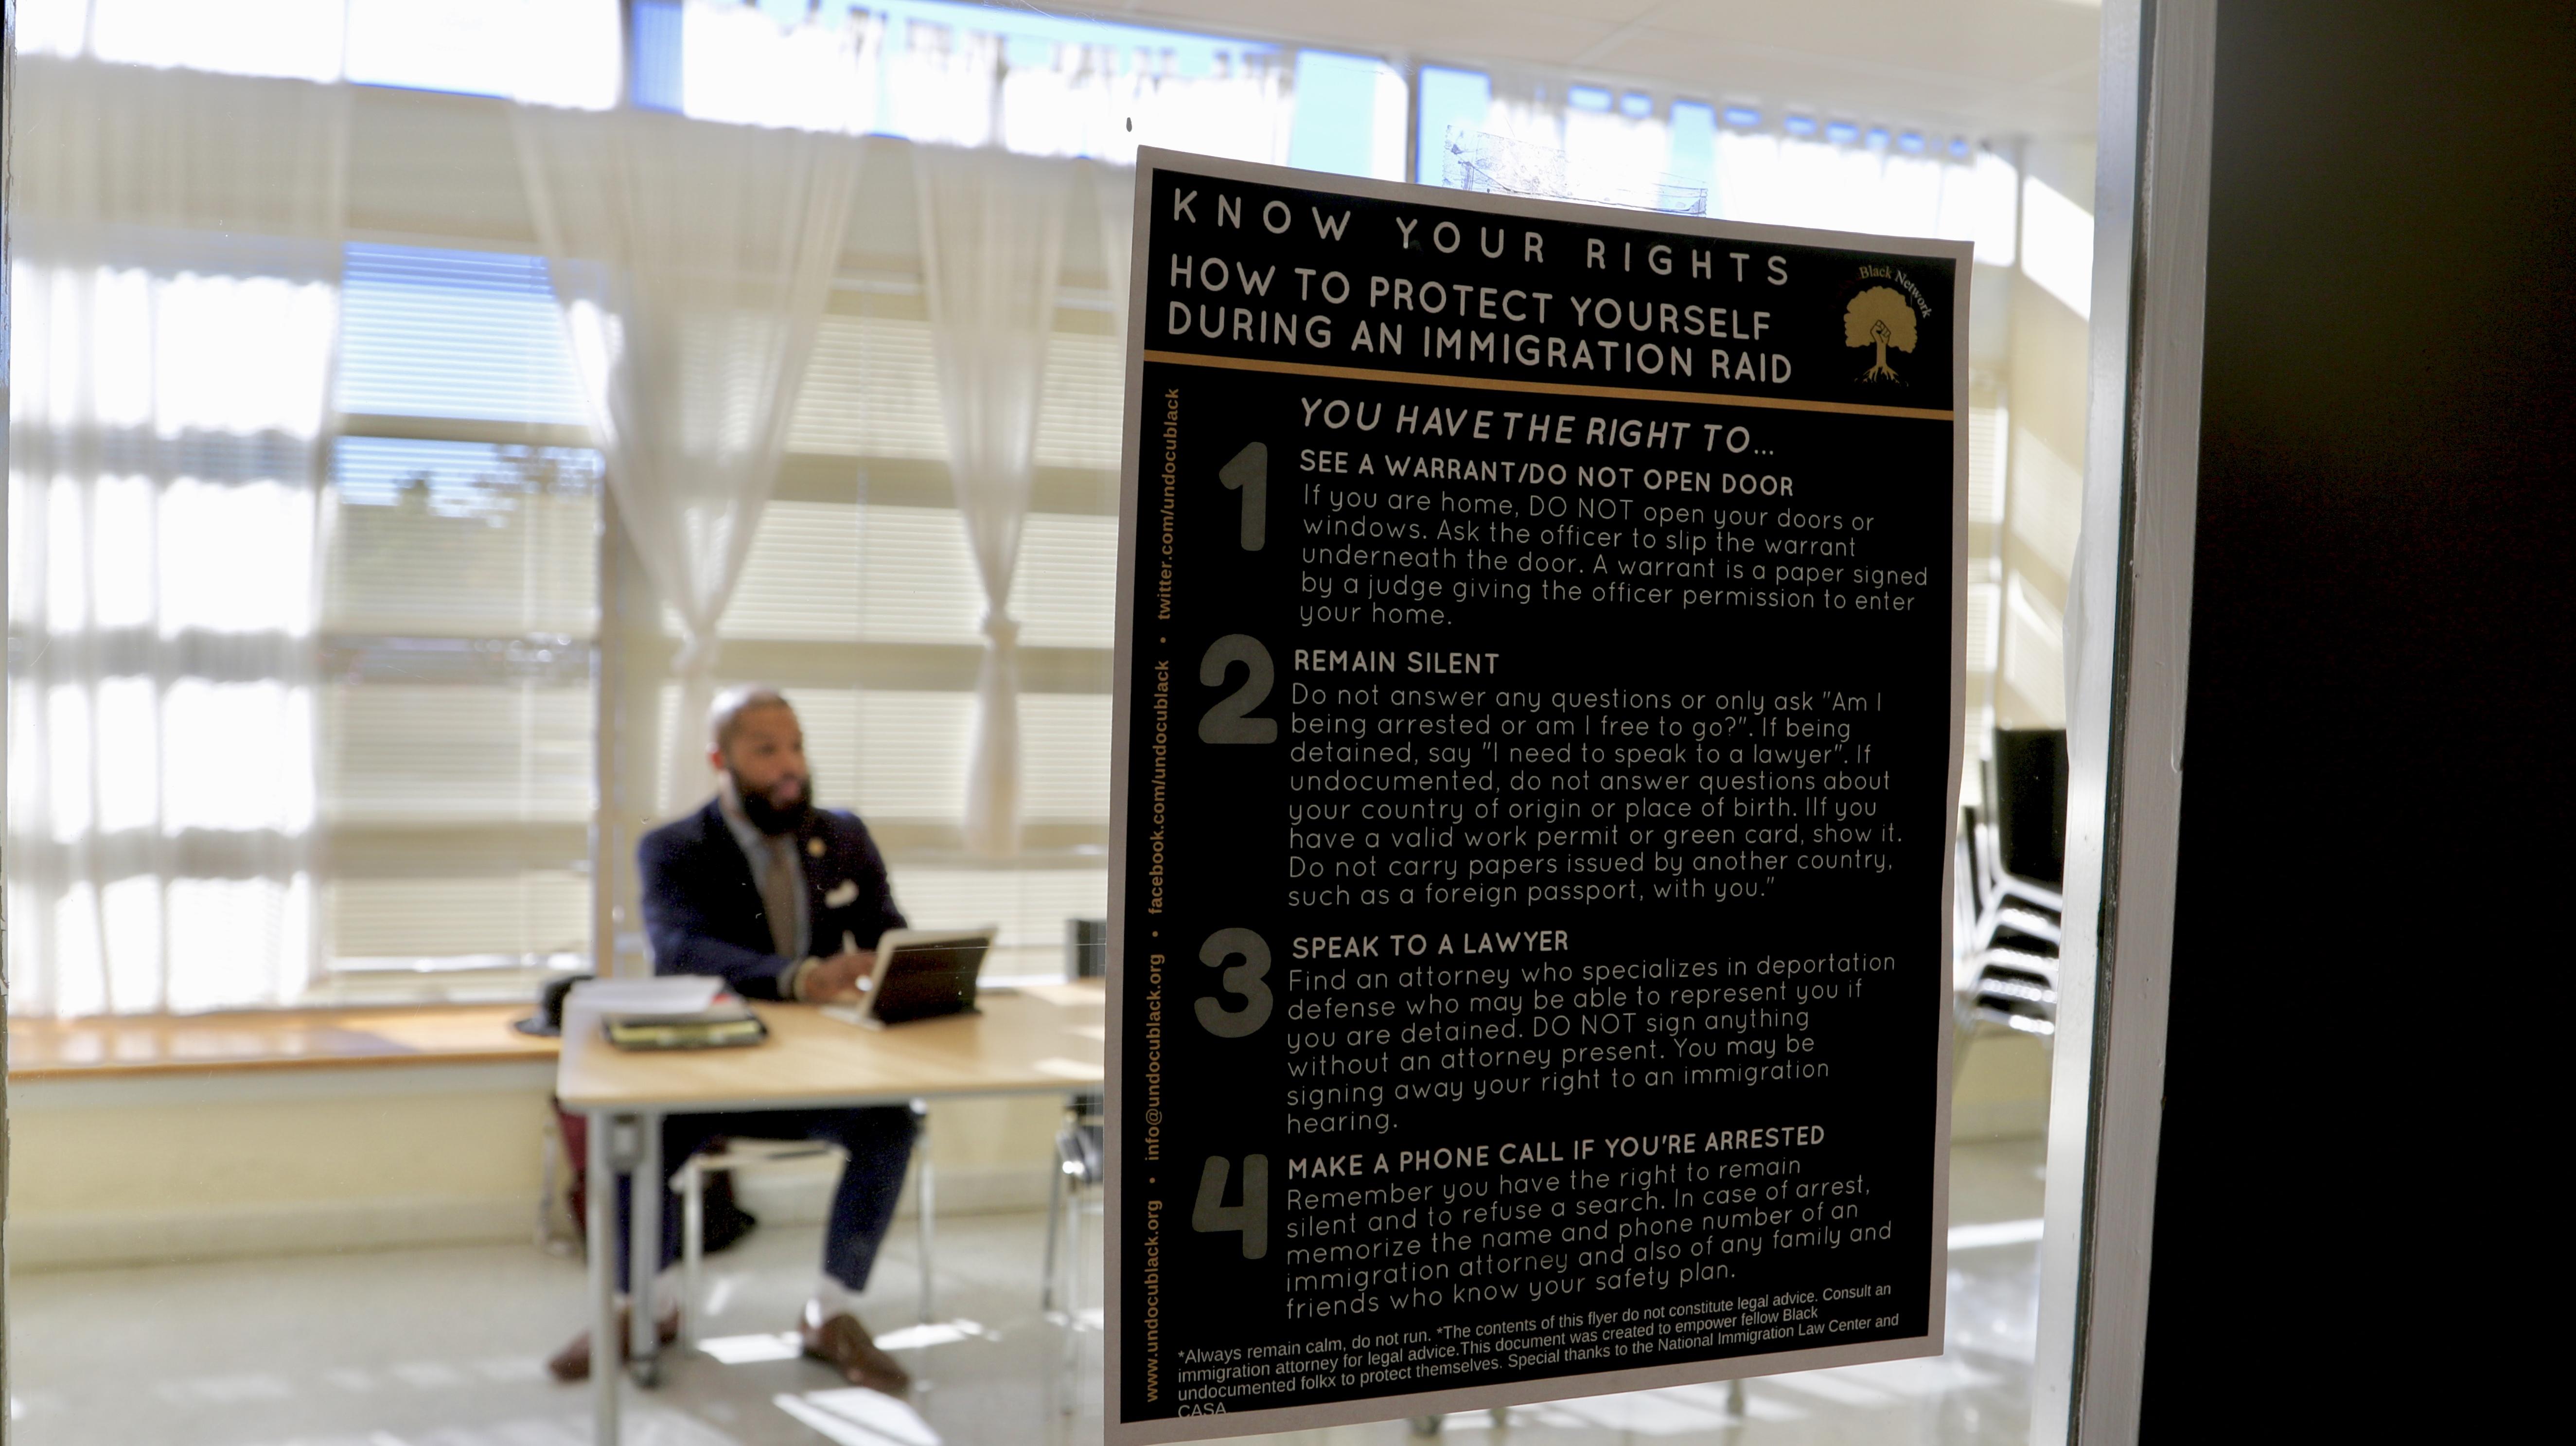 Design White Plains Ny Daca Recipients Won U0027t Go Back Into The Shadows Quietly Public 10 Questions